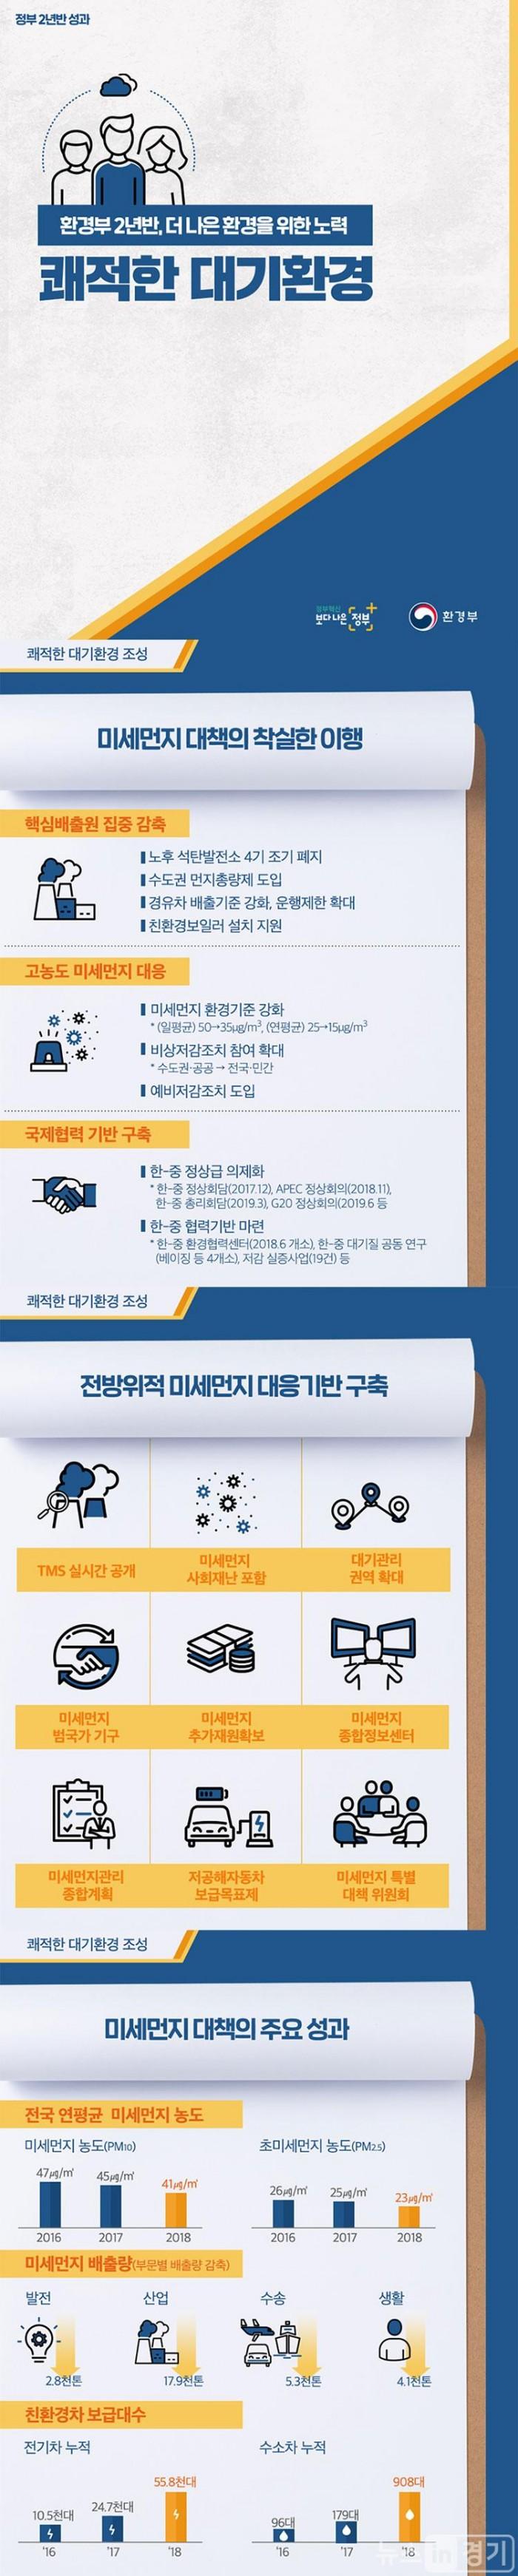 ghks_info4.jpg